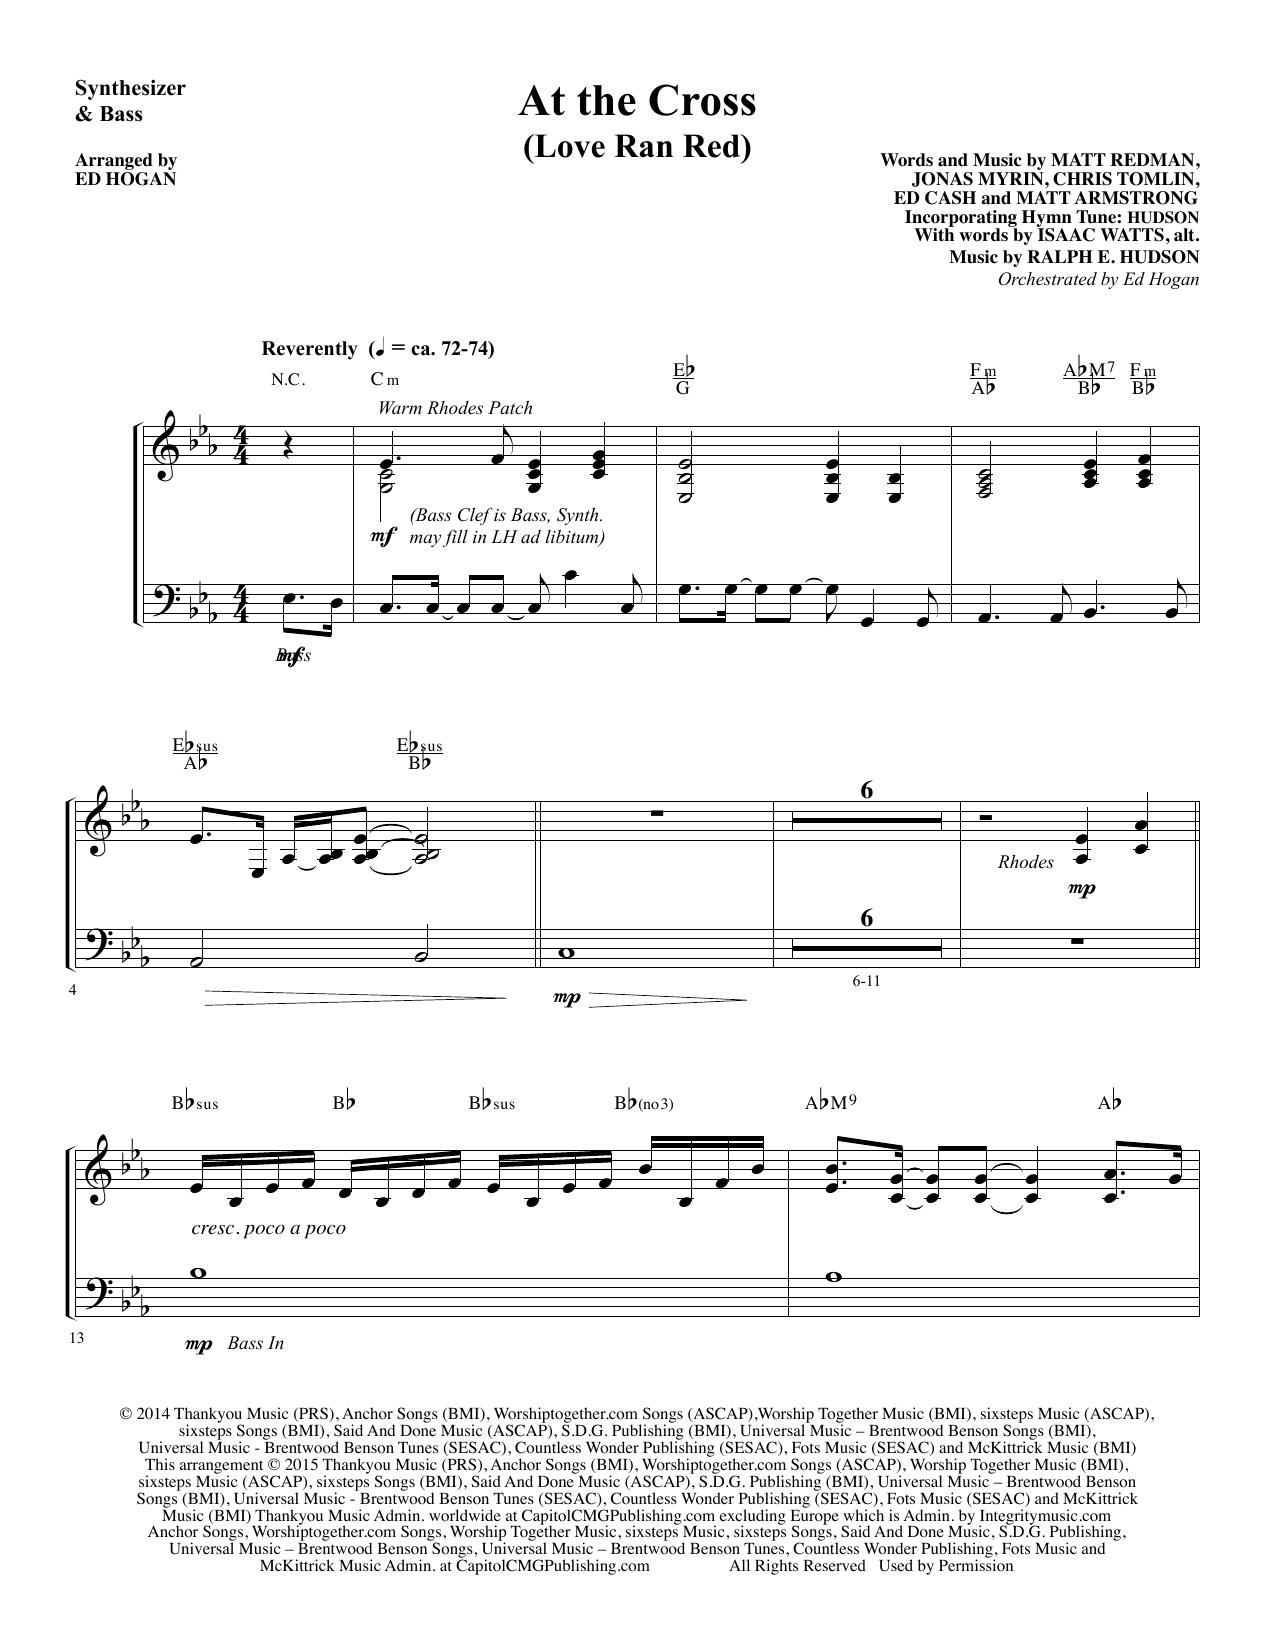 Ed Hogan At the Cross - Synthesizer & Bass sheet music notes and chords. Download Printable PDF.